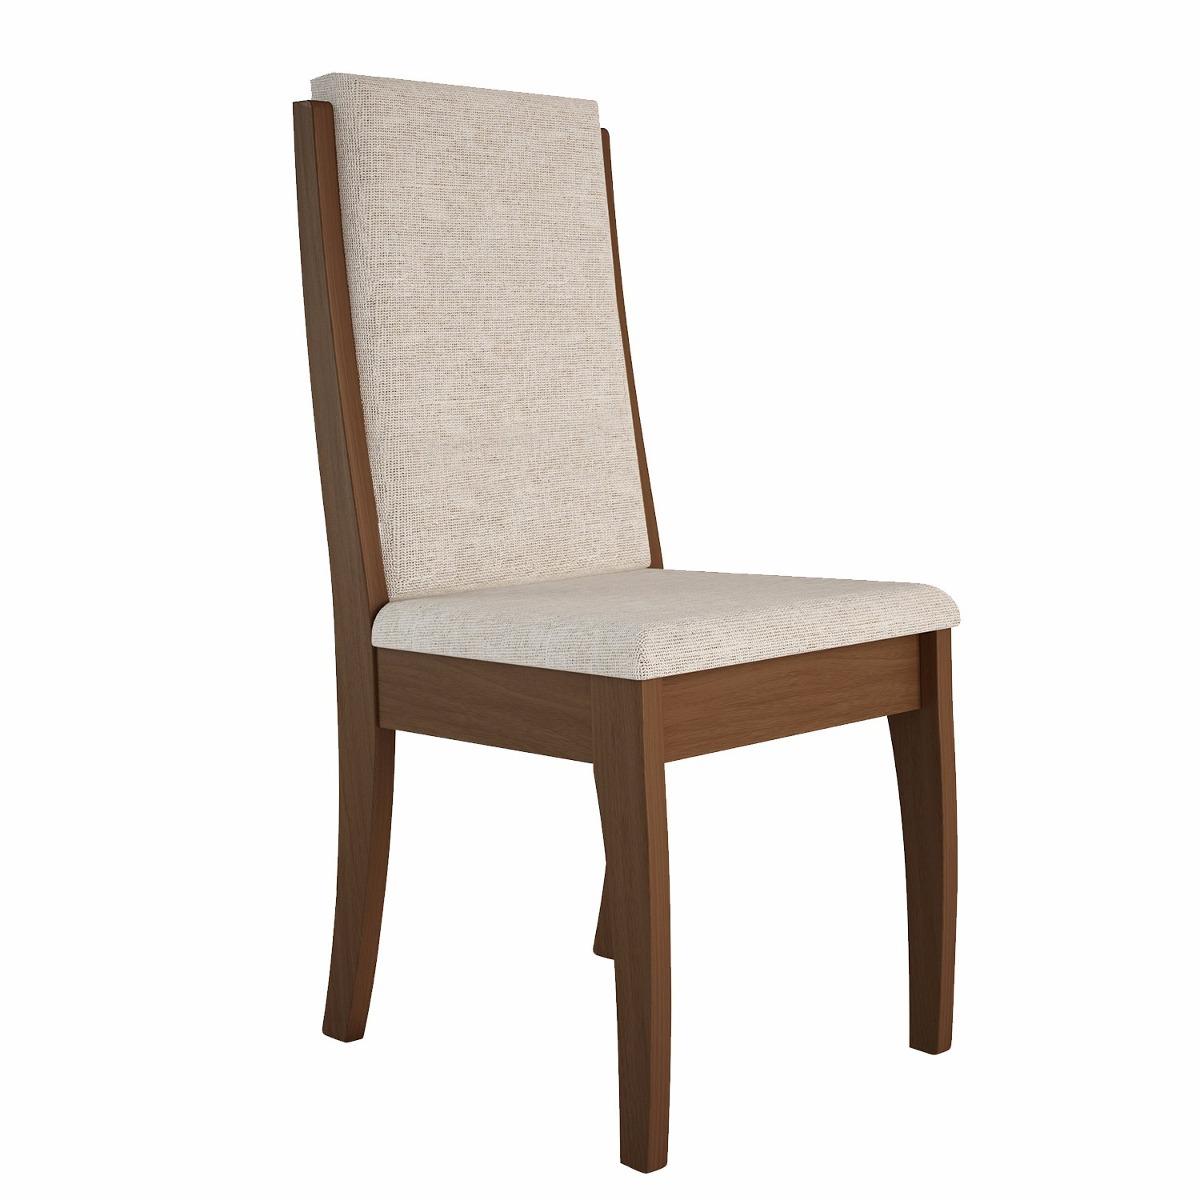 Telas para tapizar modernas renovar sillones antiguos con for Telas para tapizar sillas comedor